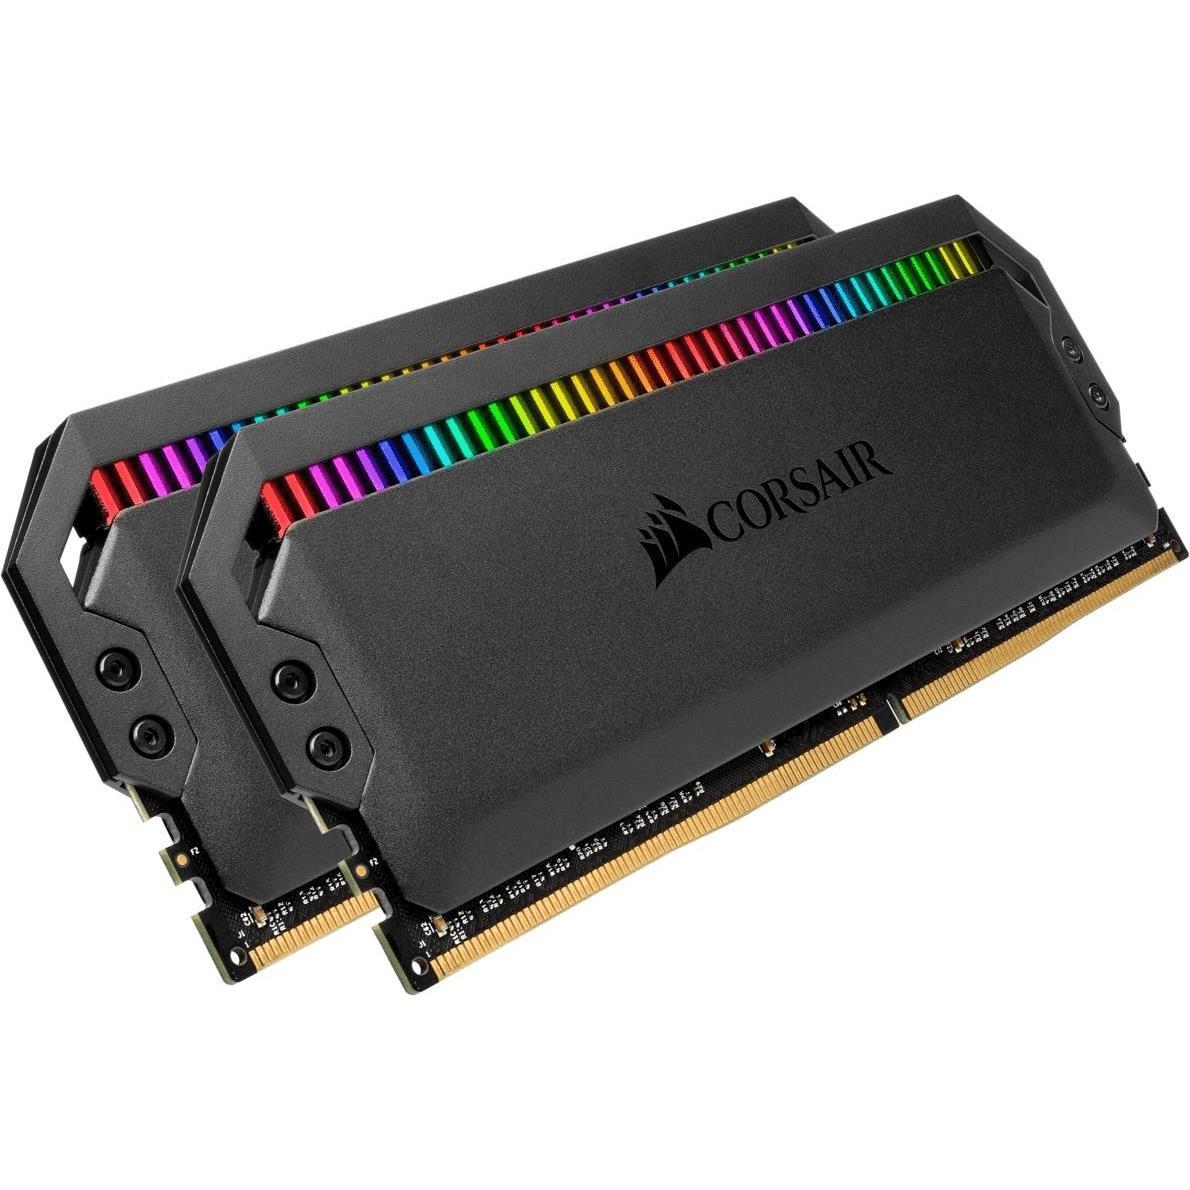 Corsair Dominator Platinum RGB memory module 16 GB 2 x 8 GB DDR4 3600 MHz CMT16GX4M2C3600C18